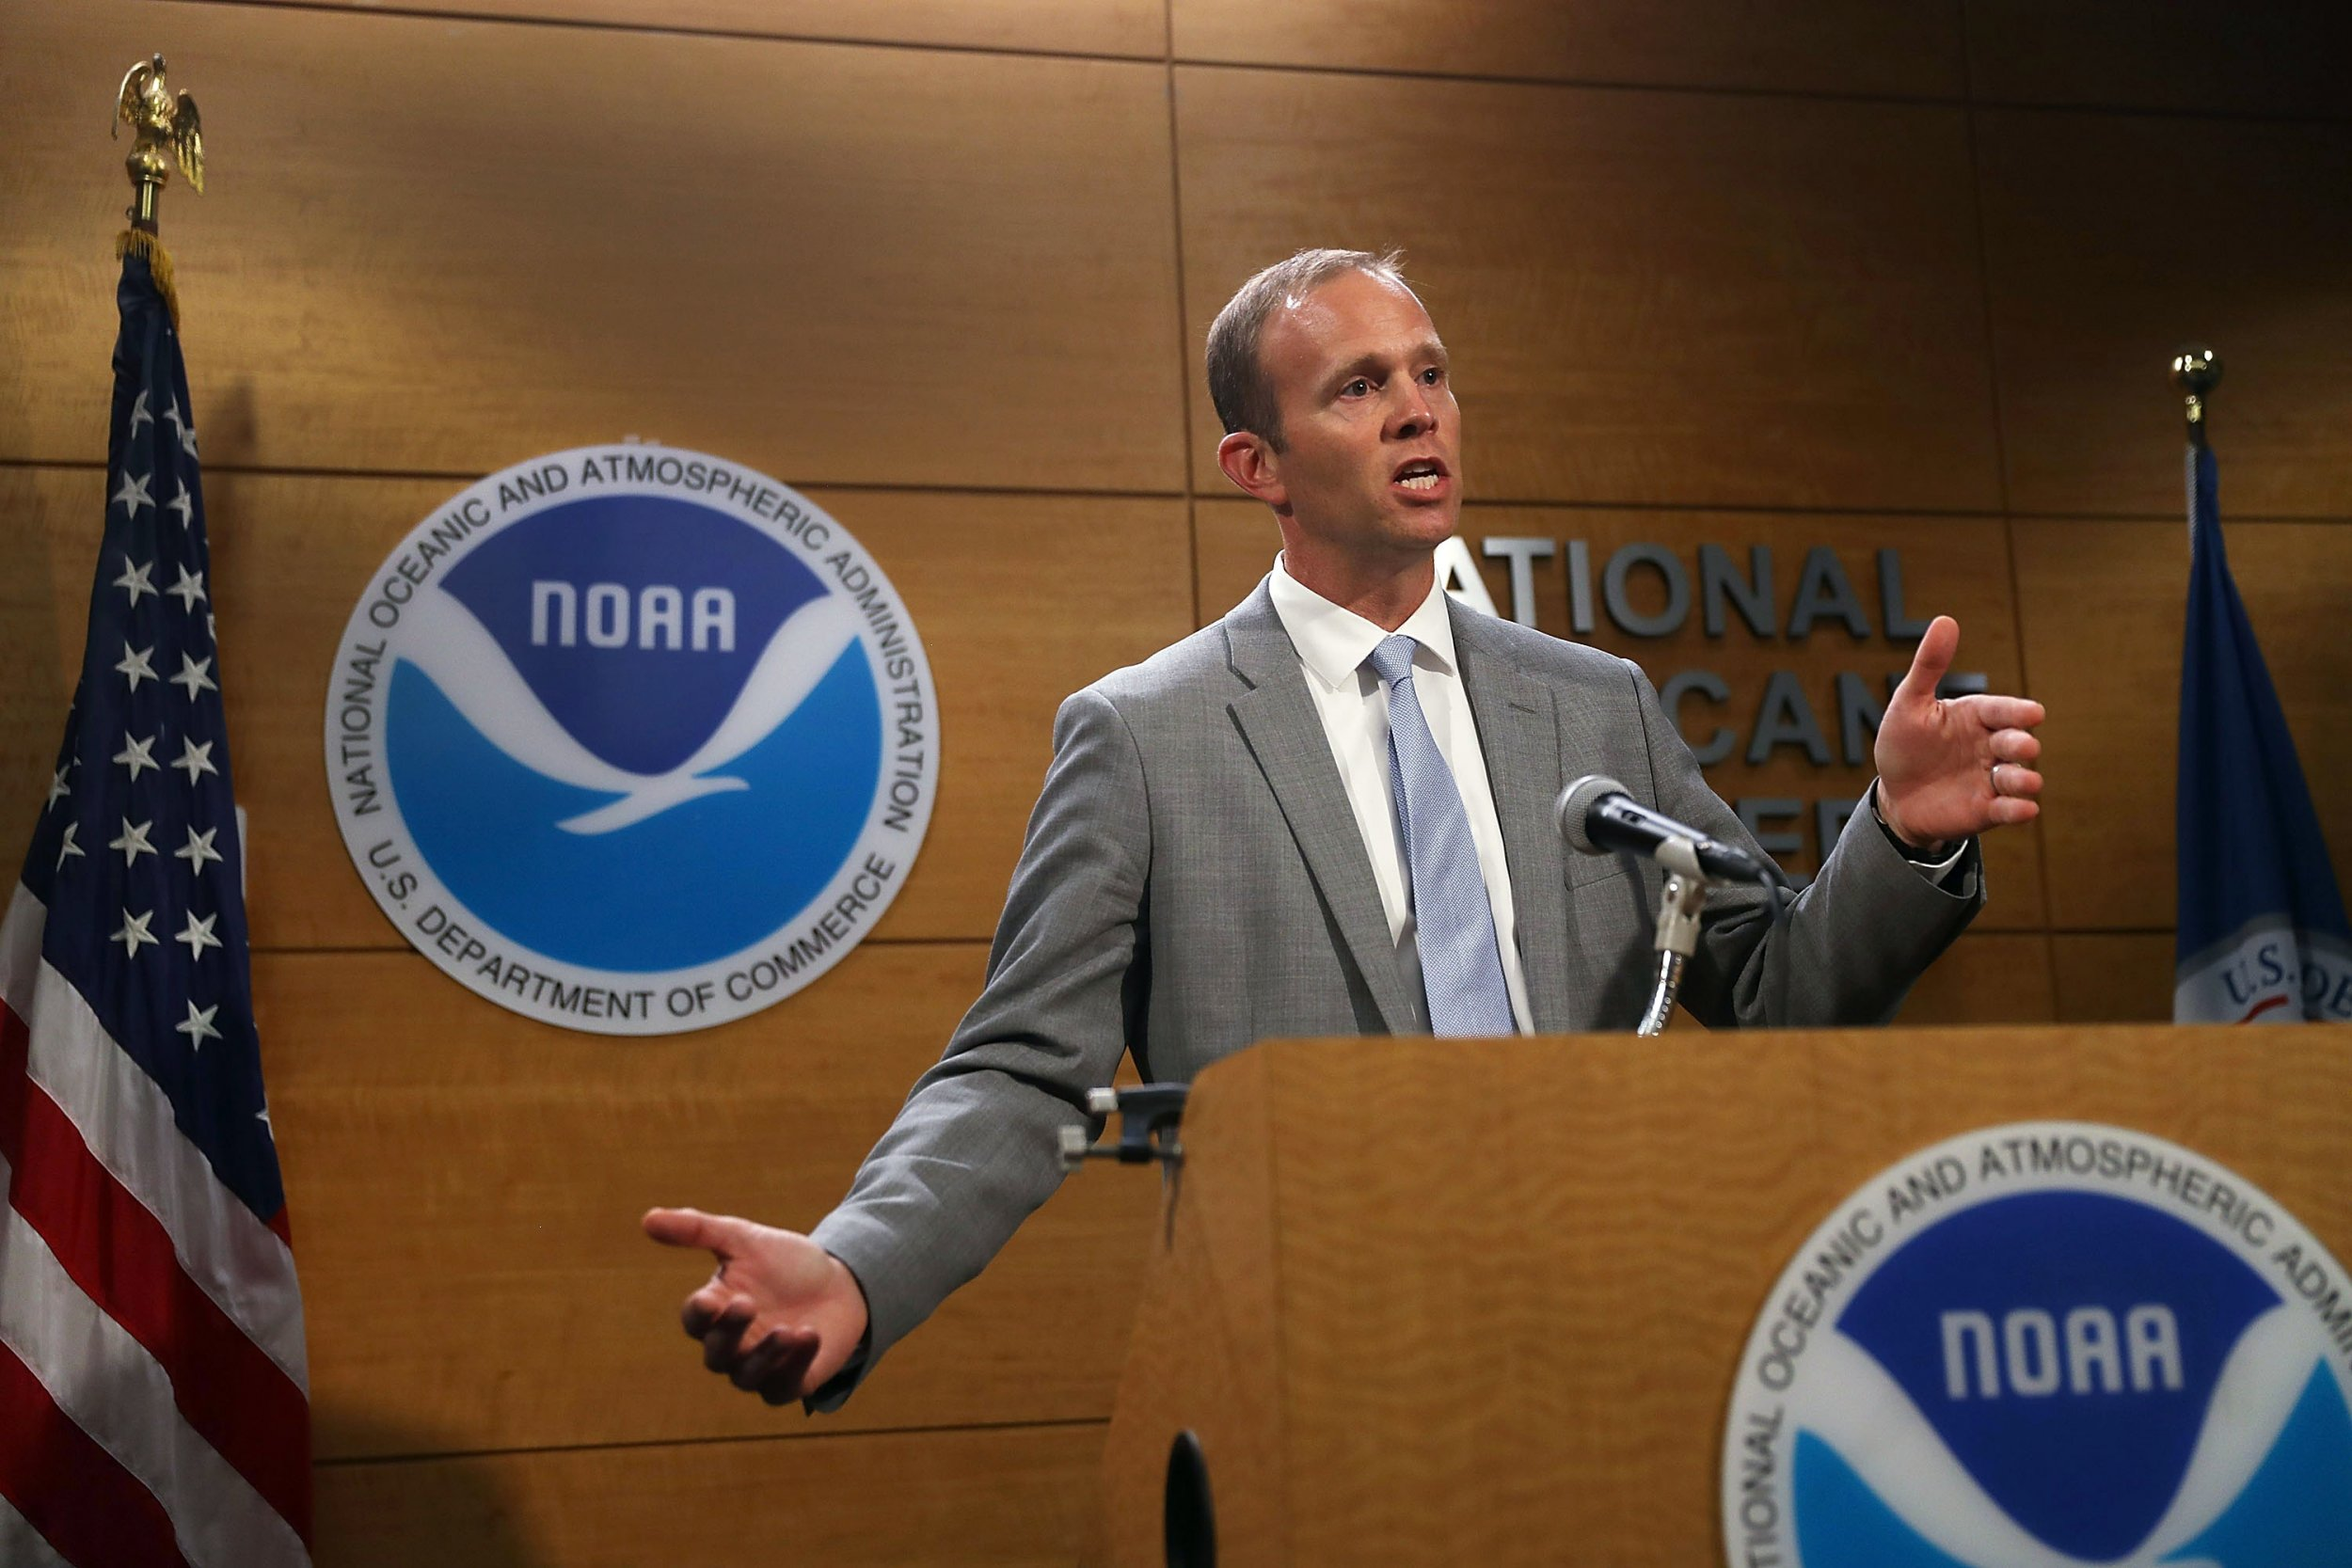 Who is Brock Long? FEMA, Hurricane florence, investigation